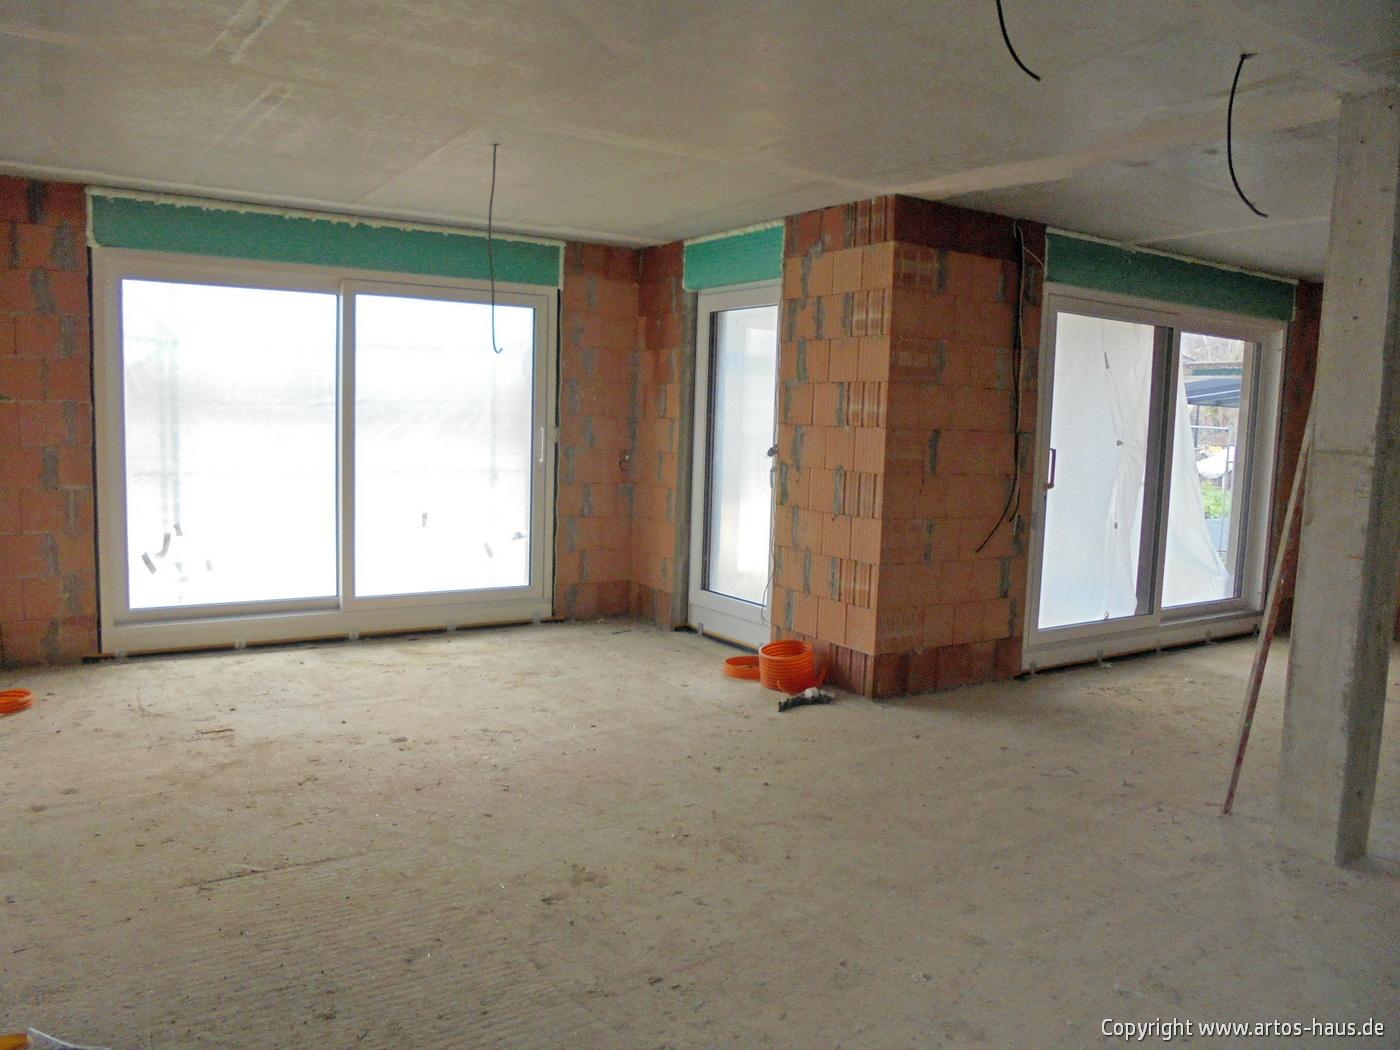 Fenstereinbau | ARTOS-HAUS Bild 6